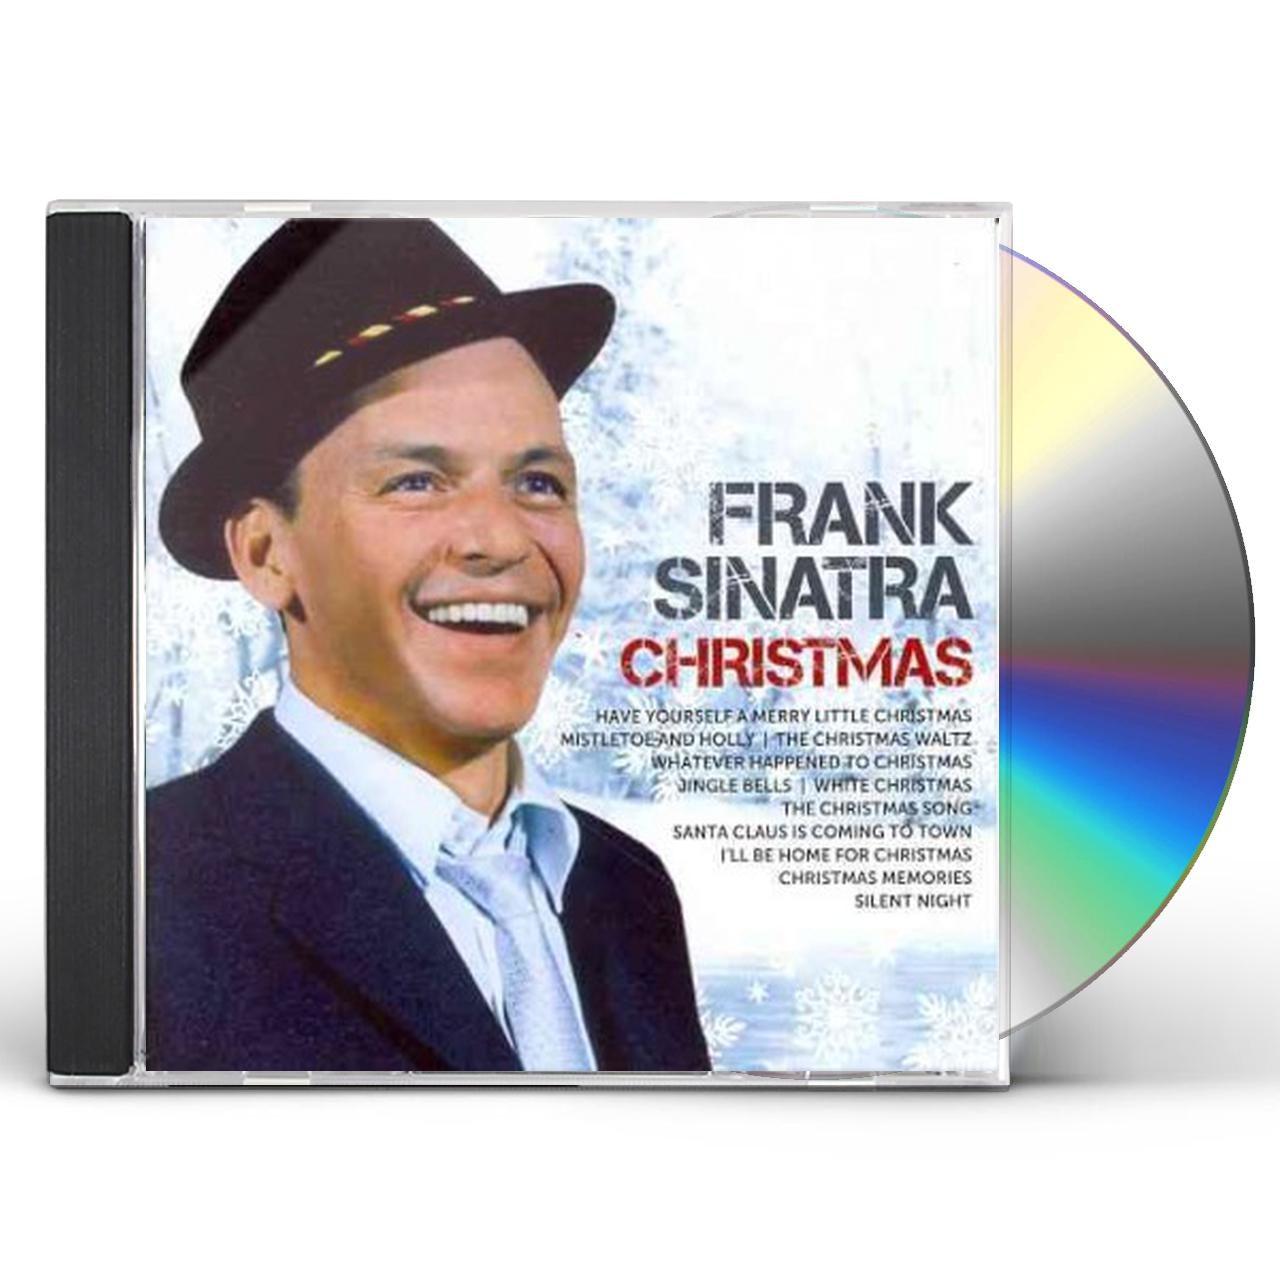 Frank Sinatra Christmas.Frank Sinatra Icon Christmas Cd